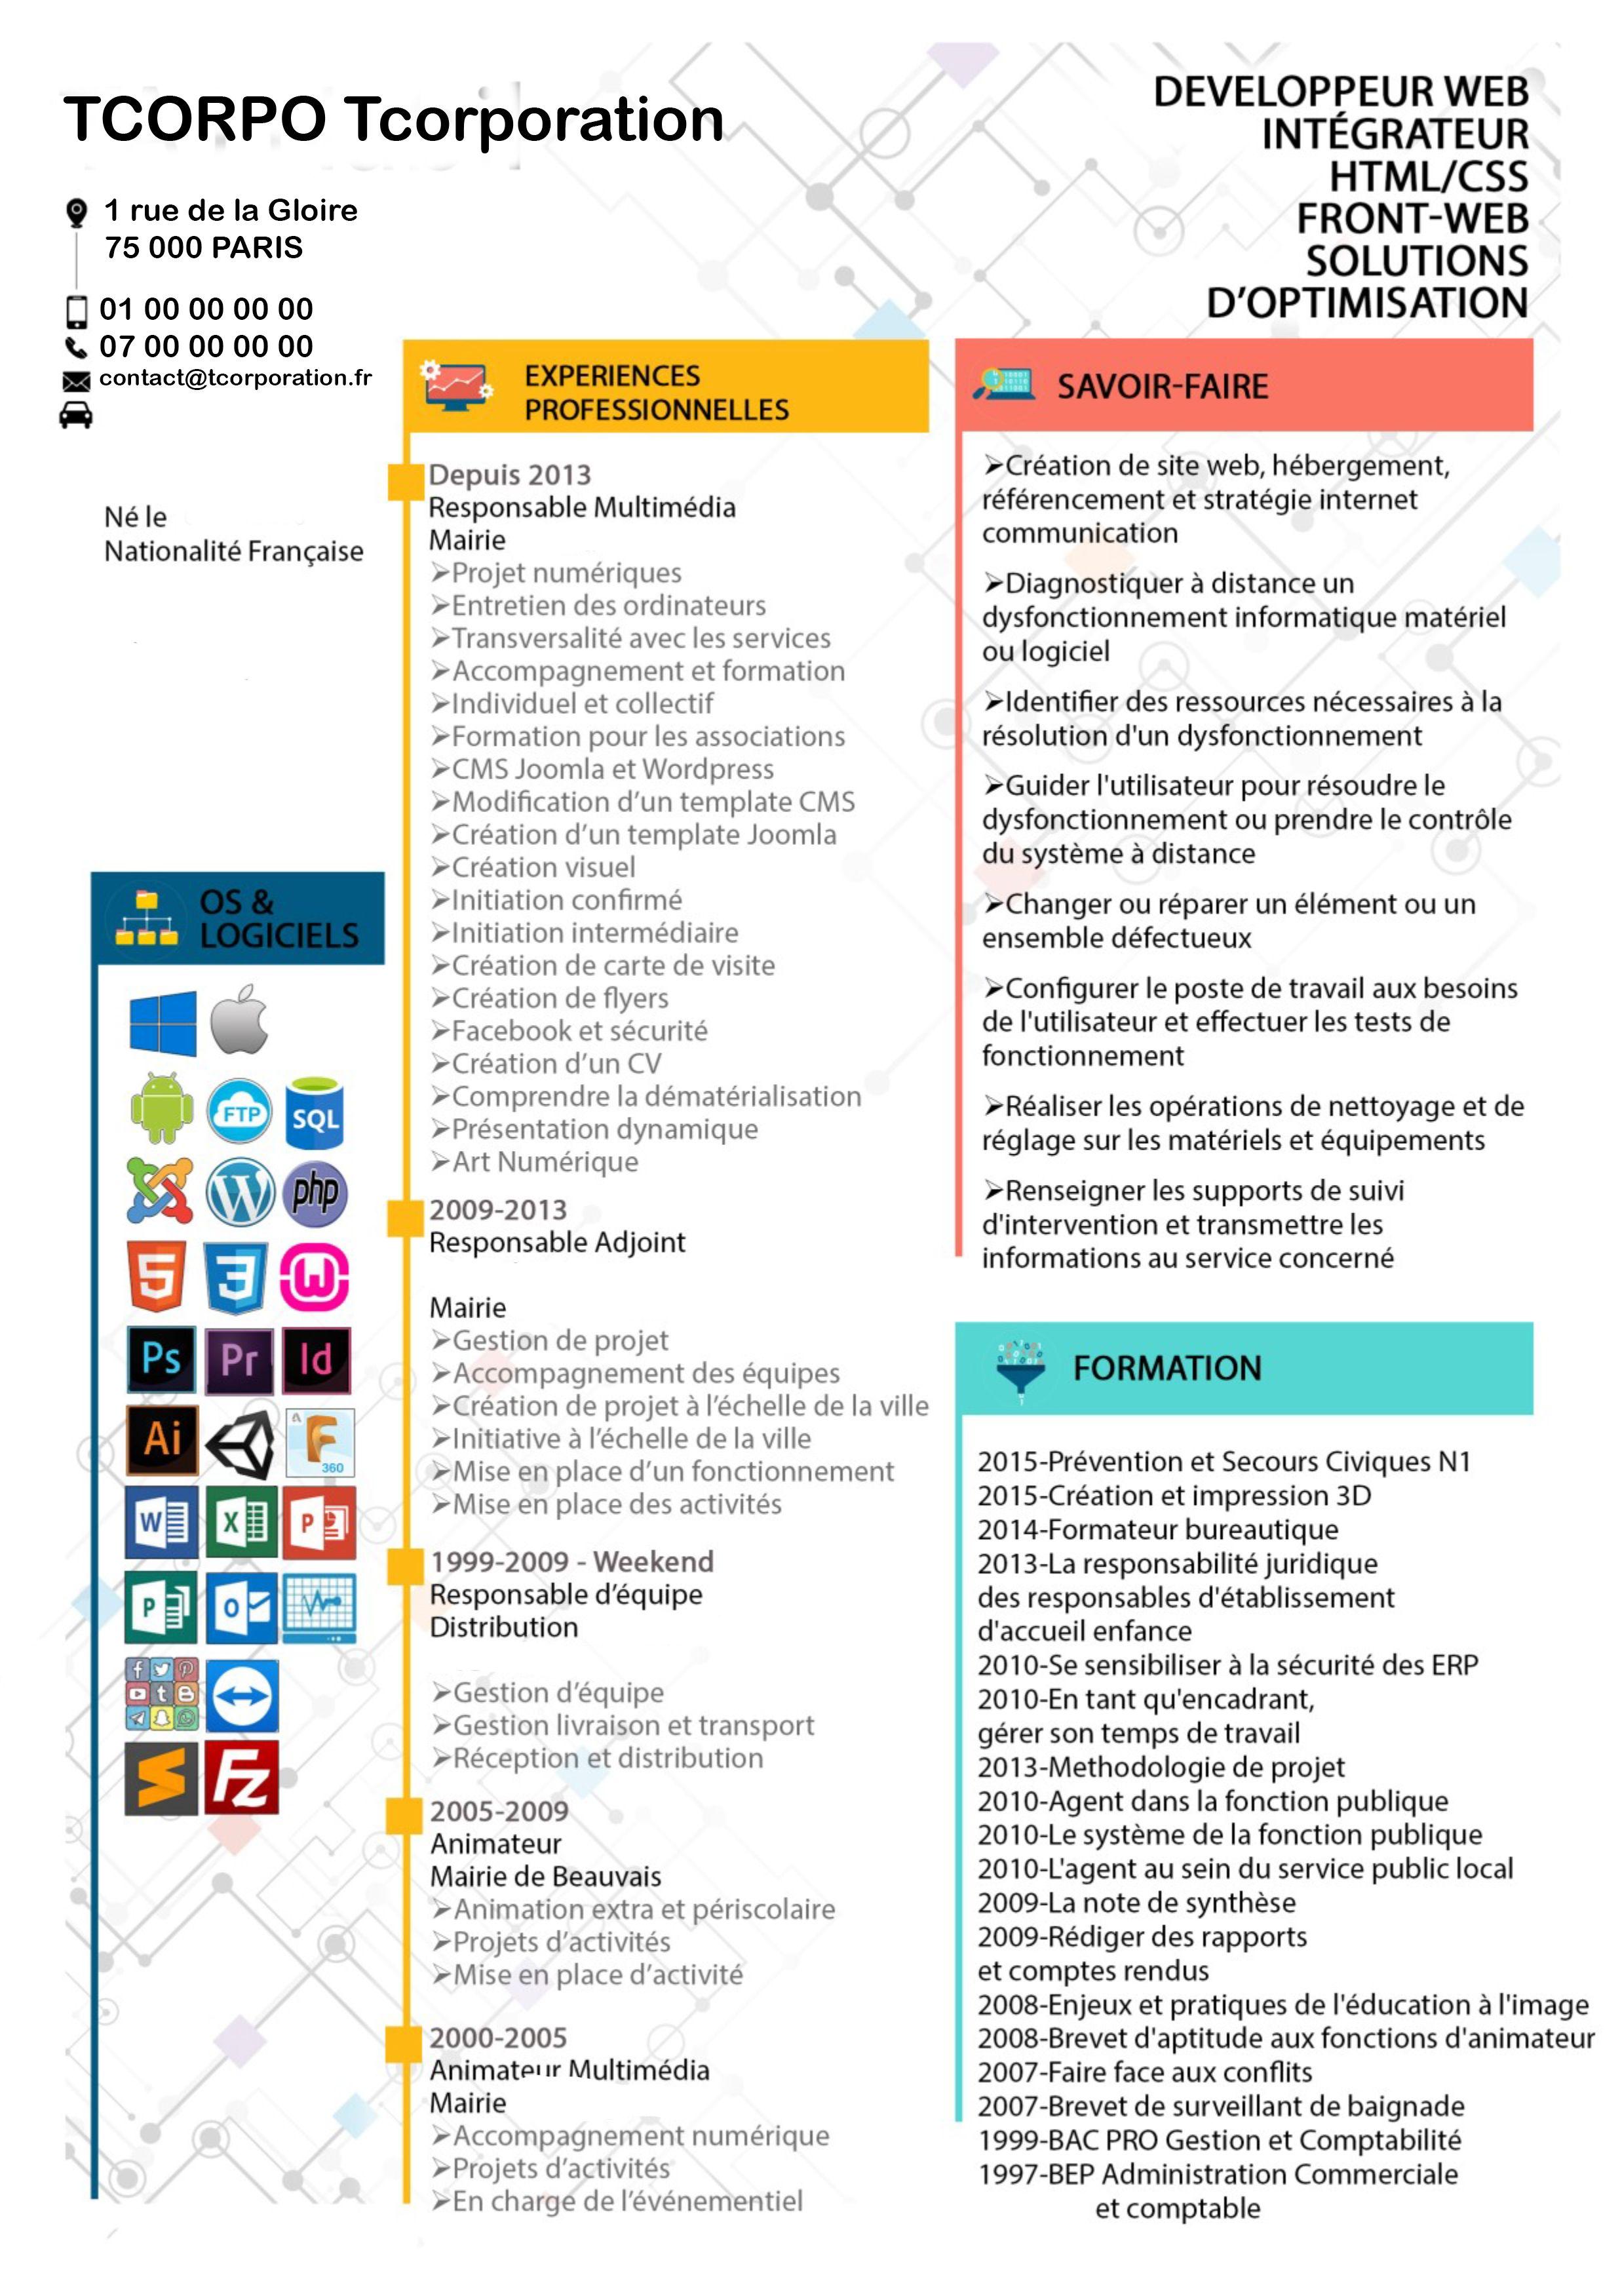 Cv Professionnel Modele De Cv Moderne A Telecharger Modele Cv Cv Professionnel Exemple De Cv Professionnel